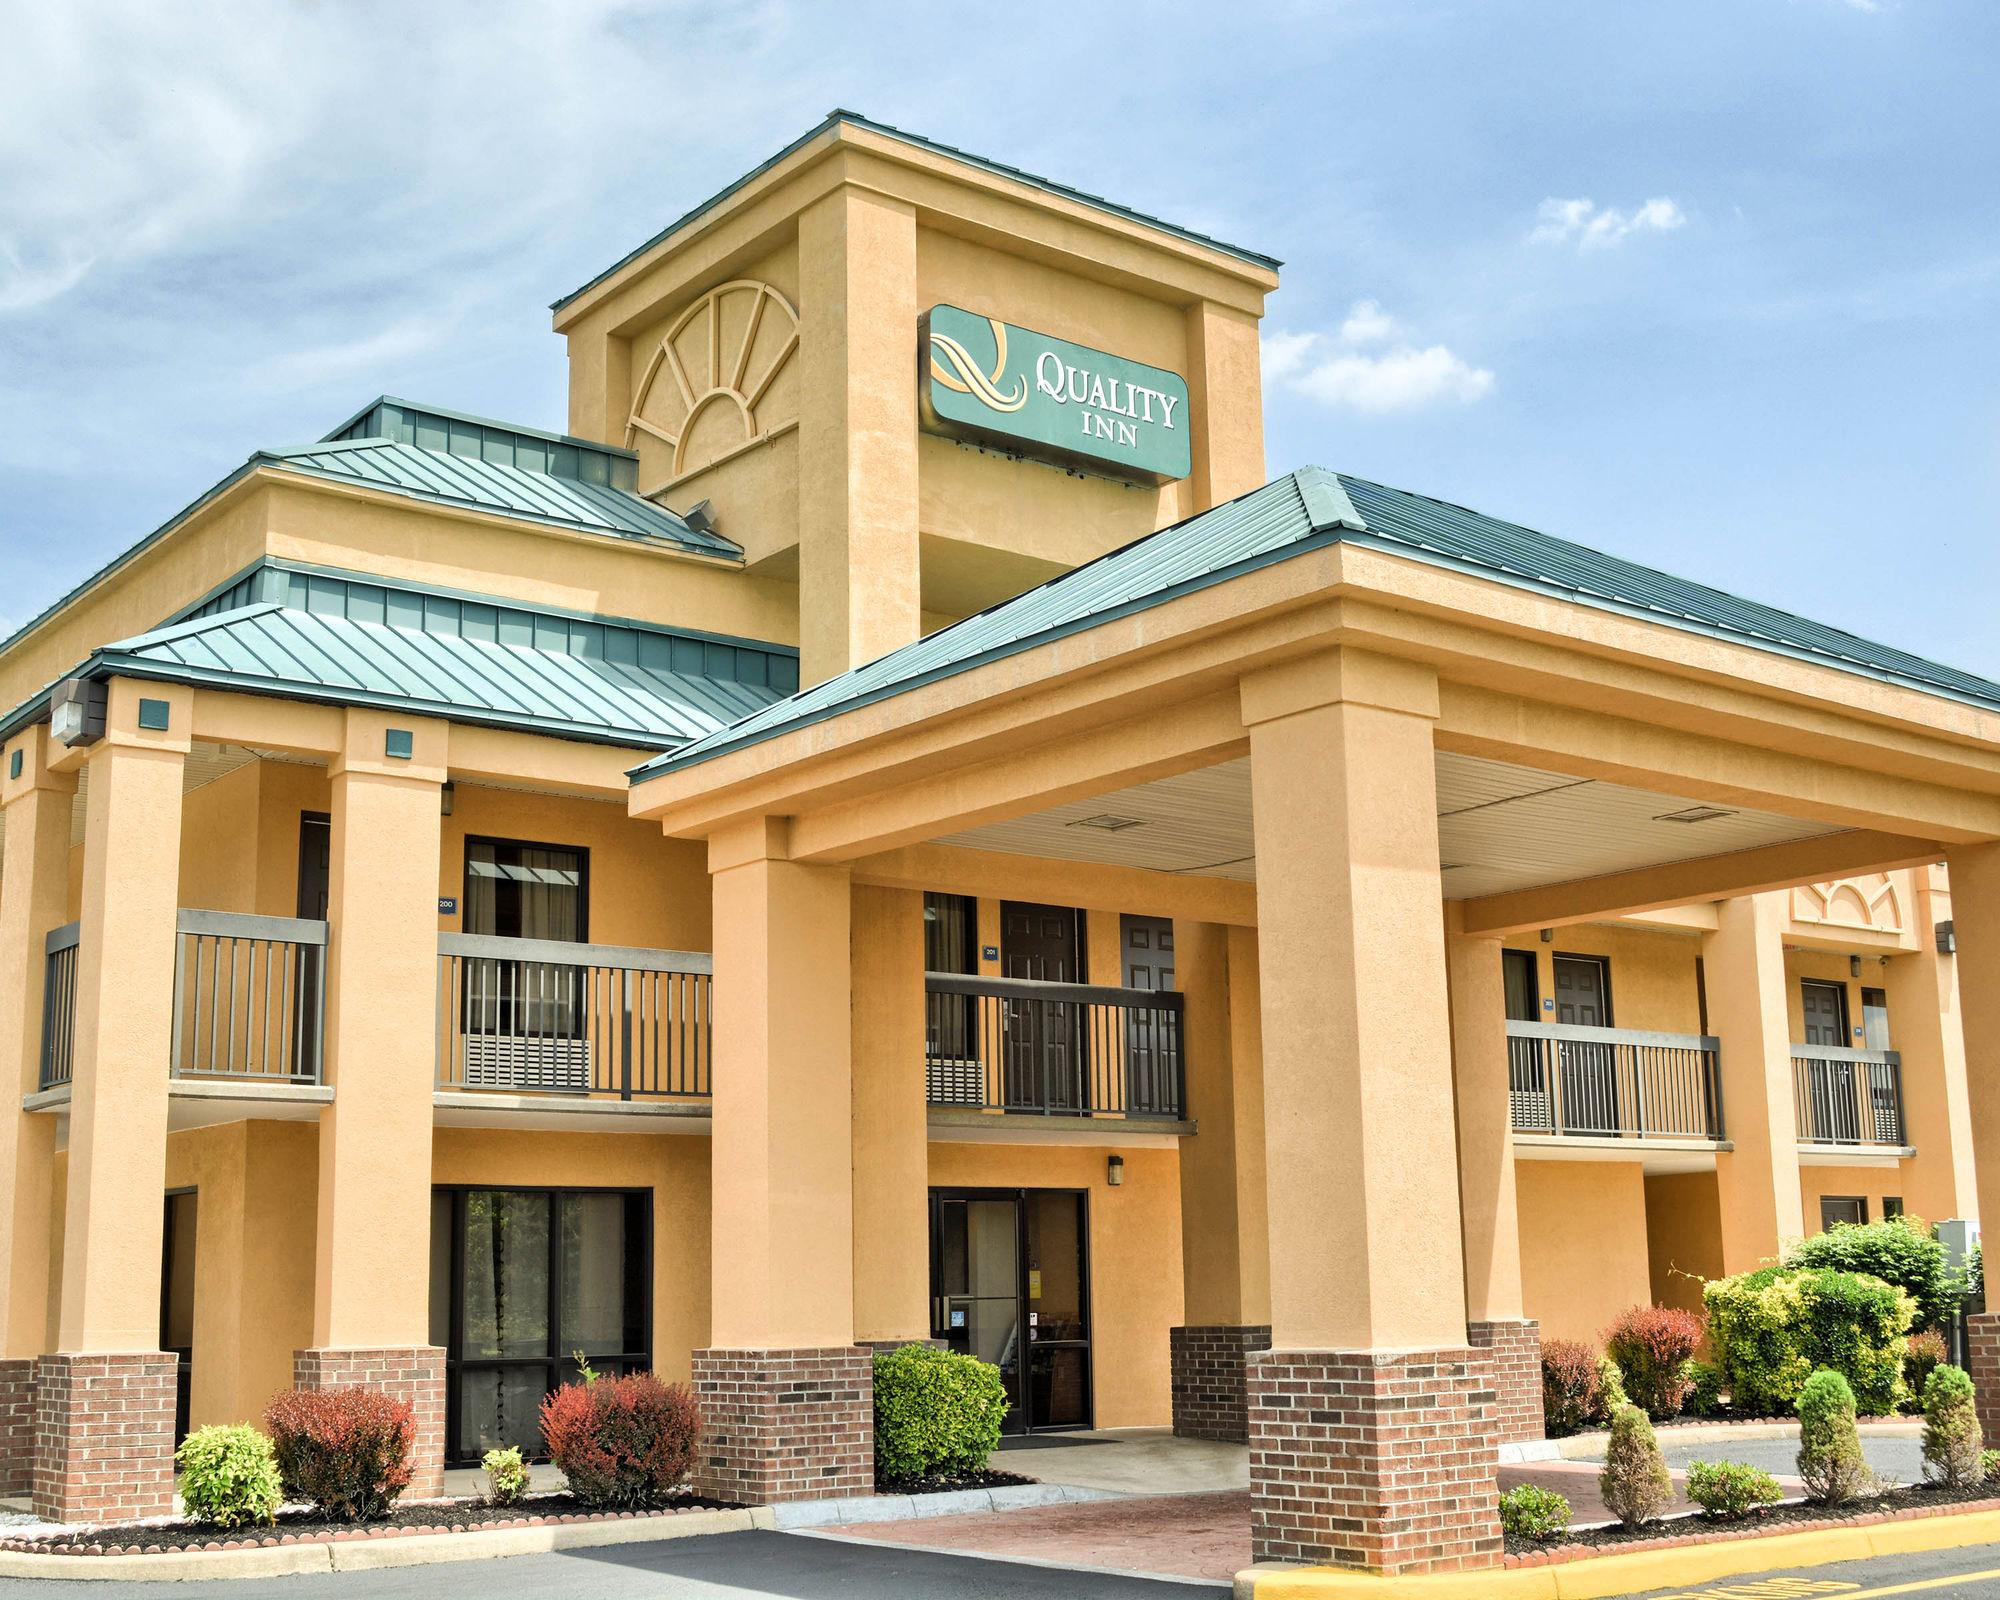 Quality Inn Thornburg in Thornburg, VA